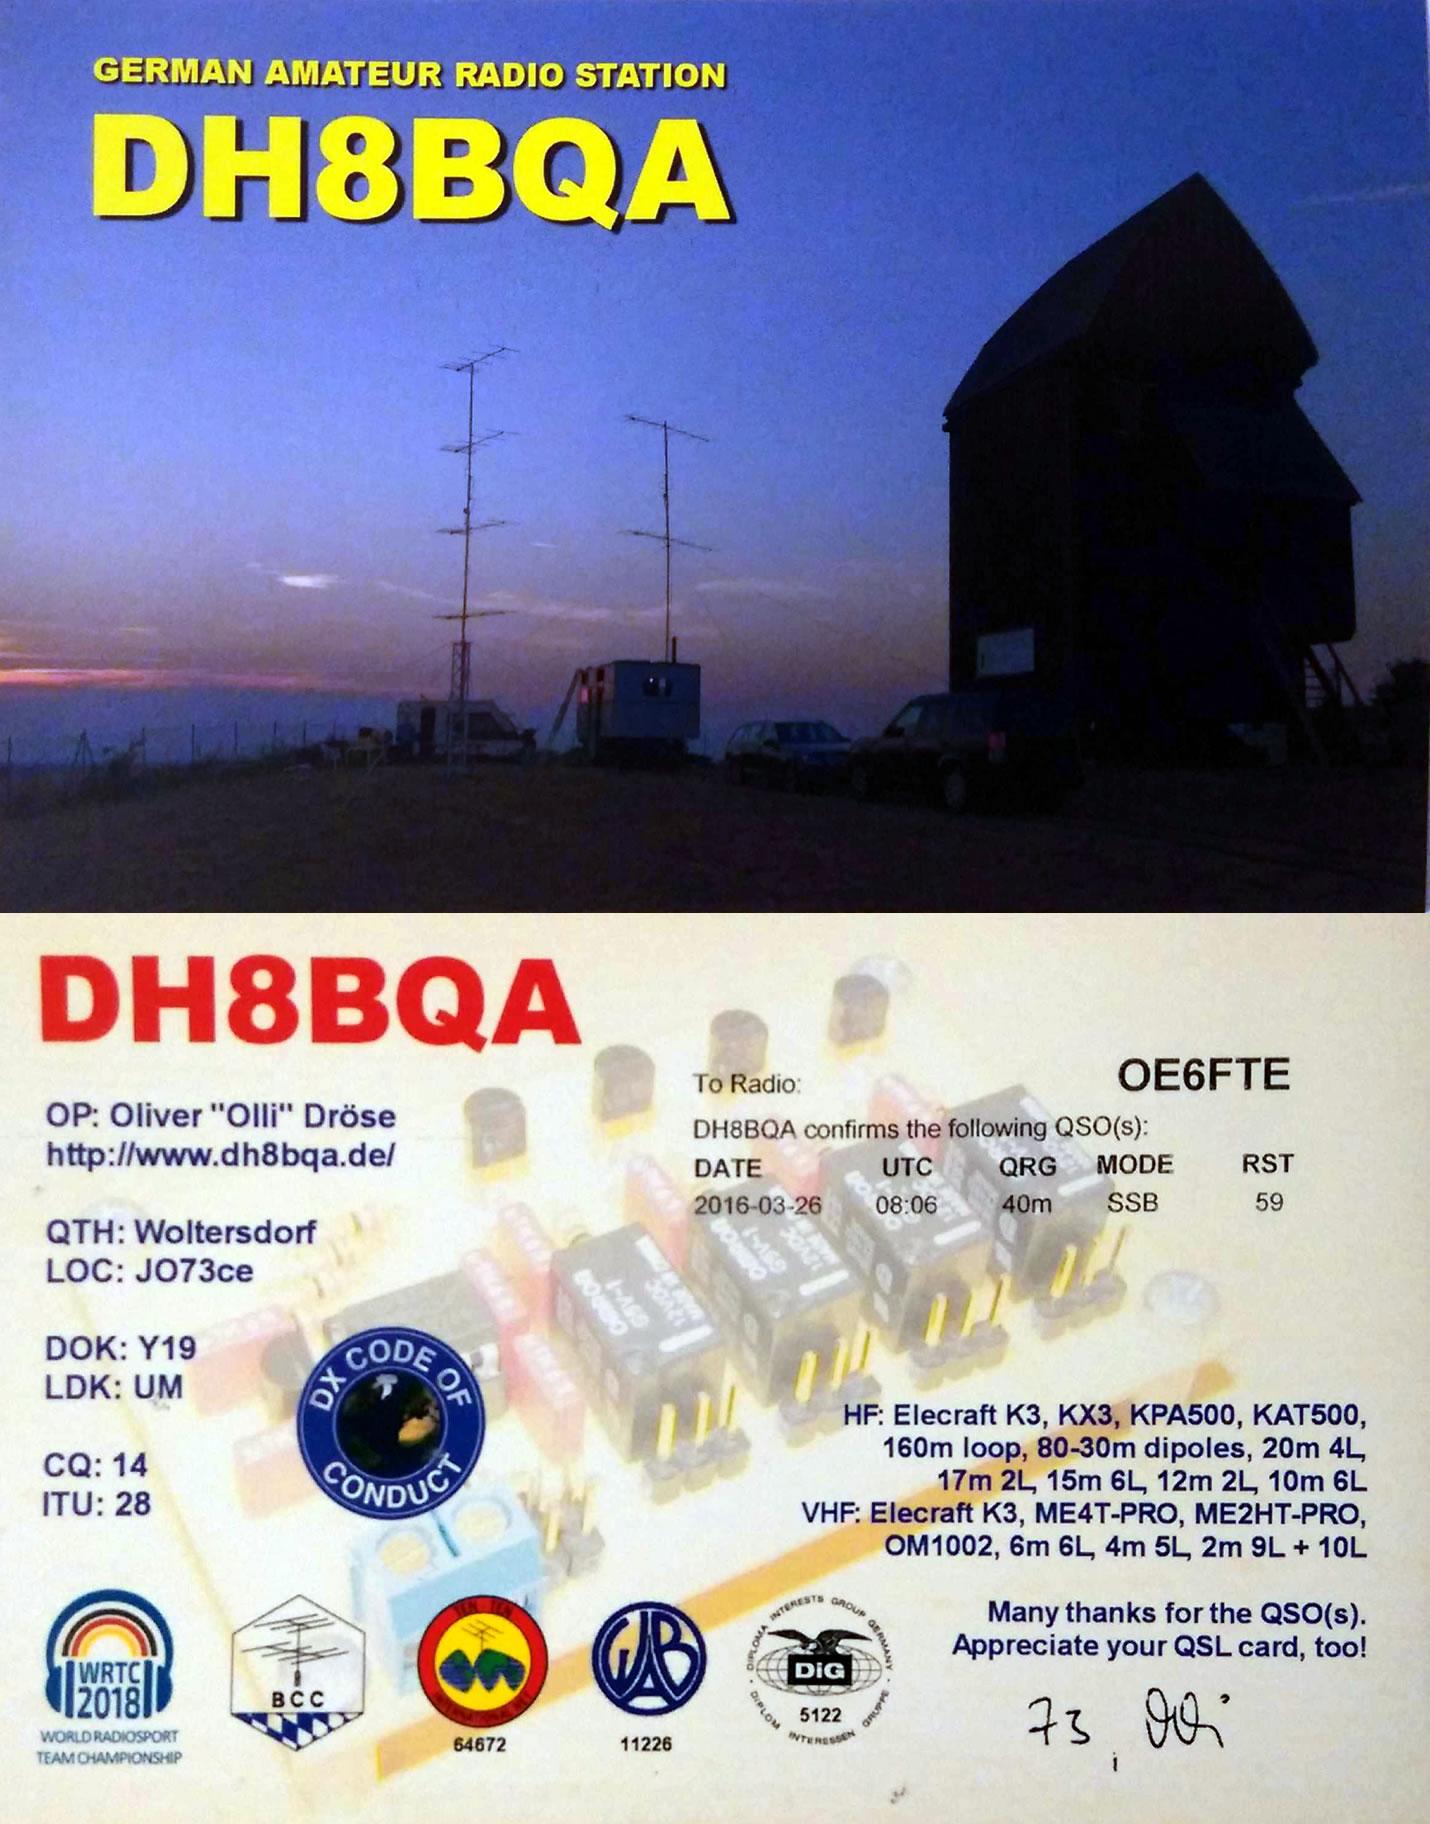 DH8BQA